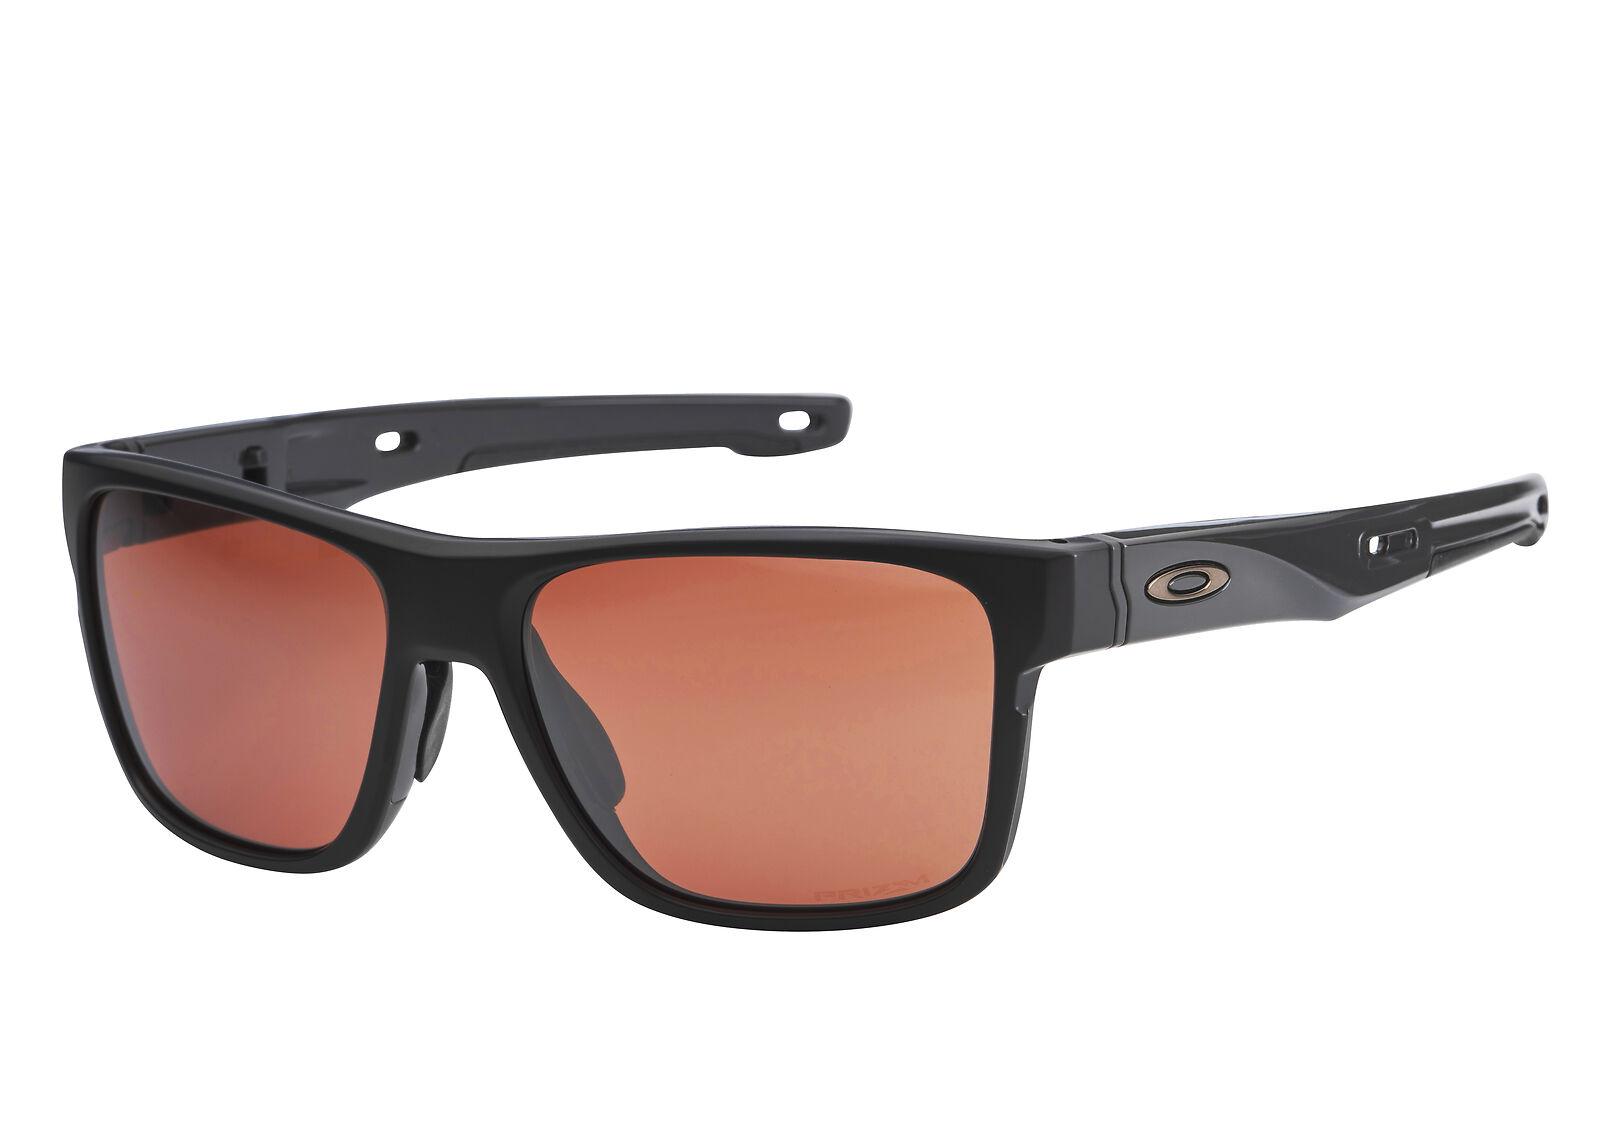 5c9b4748fe4 Oakley Crossrange Sunglasses Matte Black Prizm Dark Golf OO9361-17 9361-17  57mm